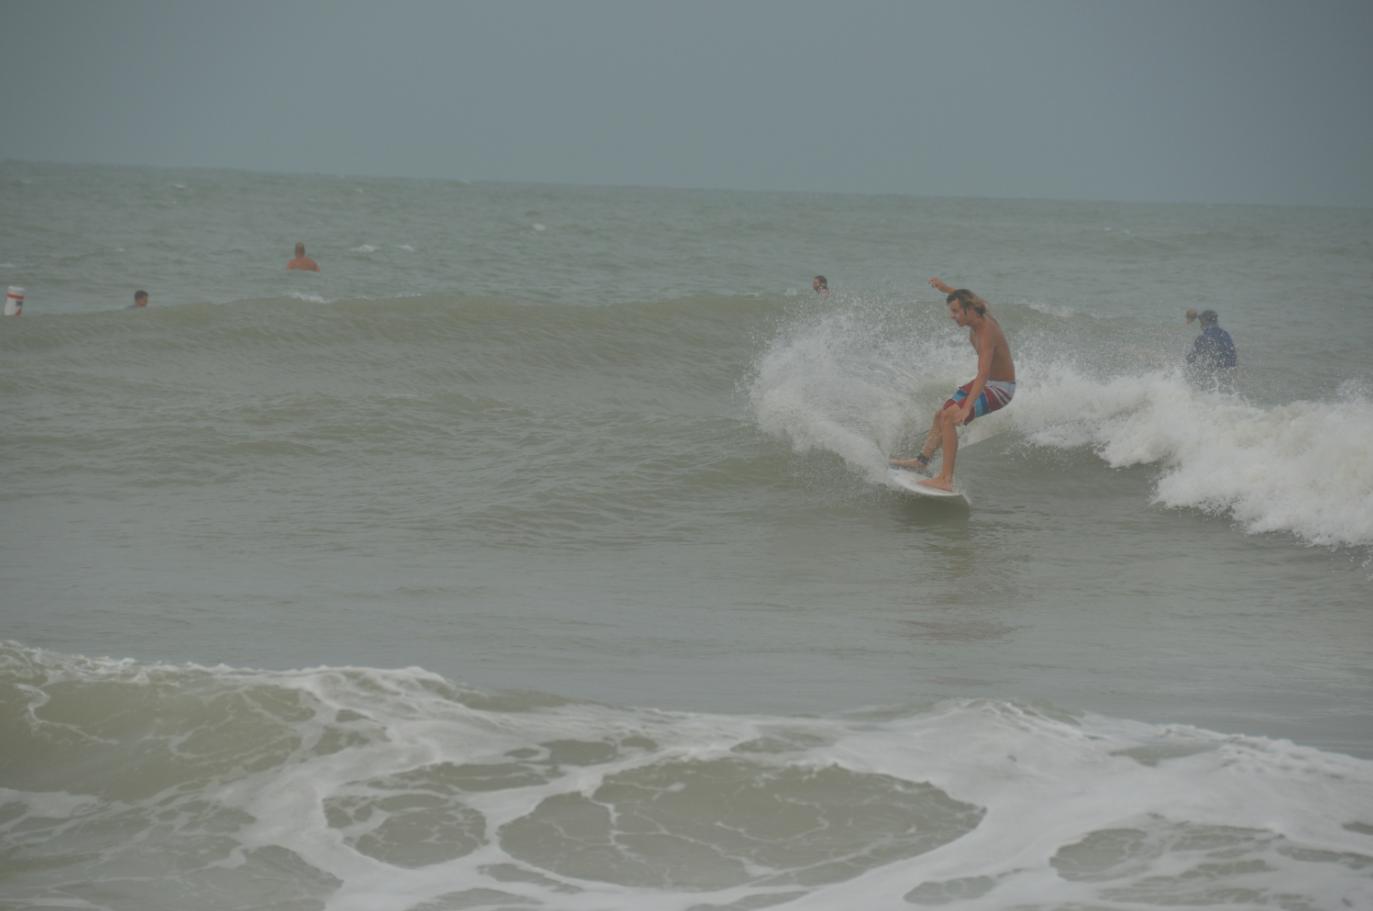 Hurricane Hermine Gulf Surf Gallery WwwSurfingtheGulfcom - 16 epic surfing photos